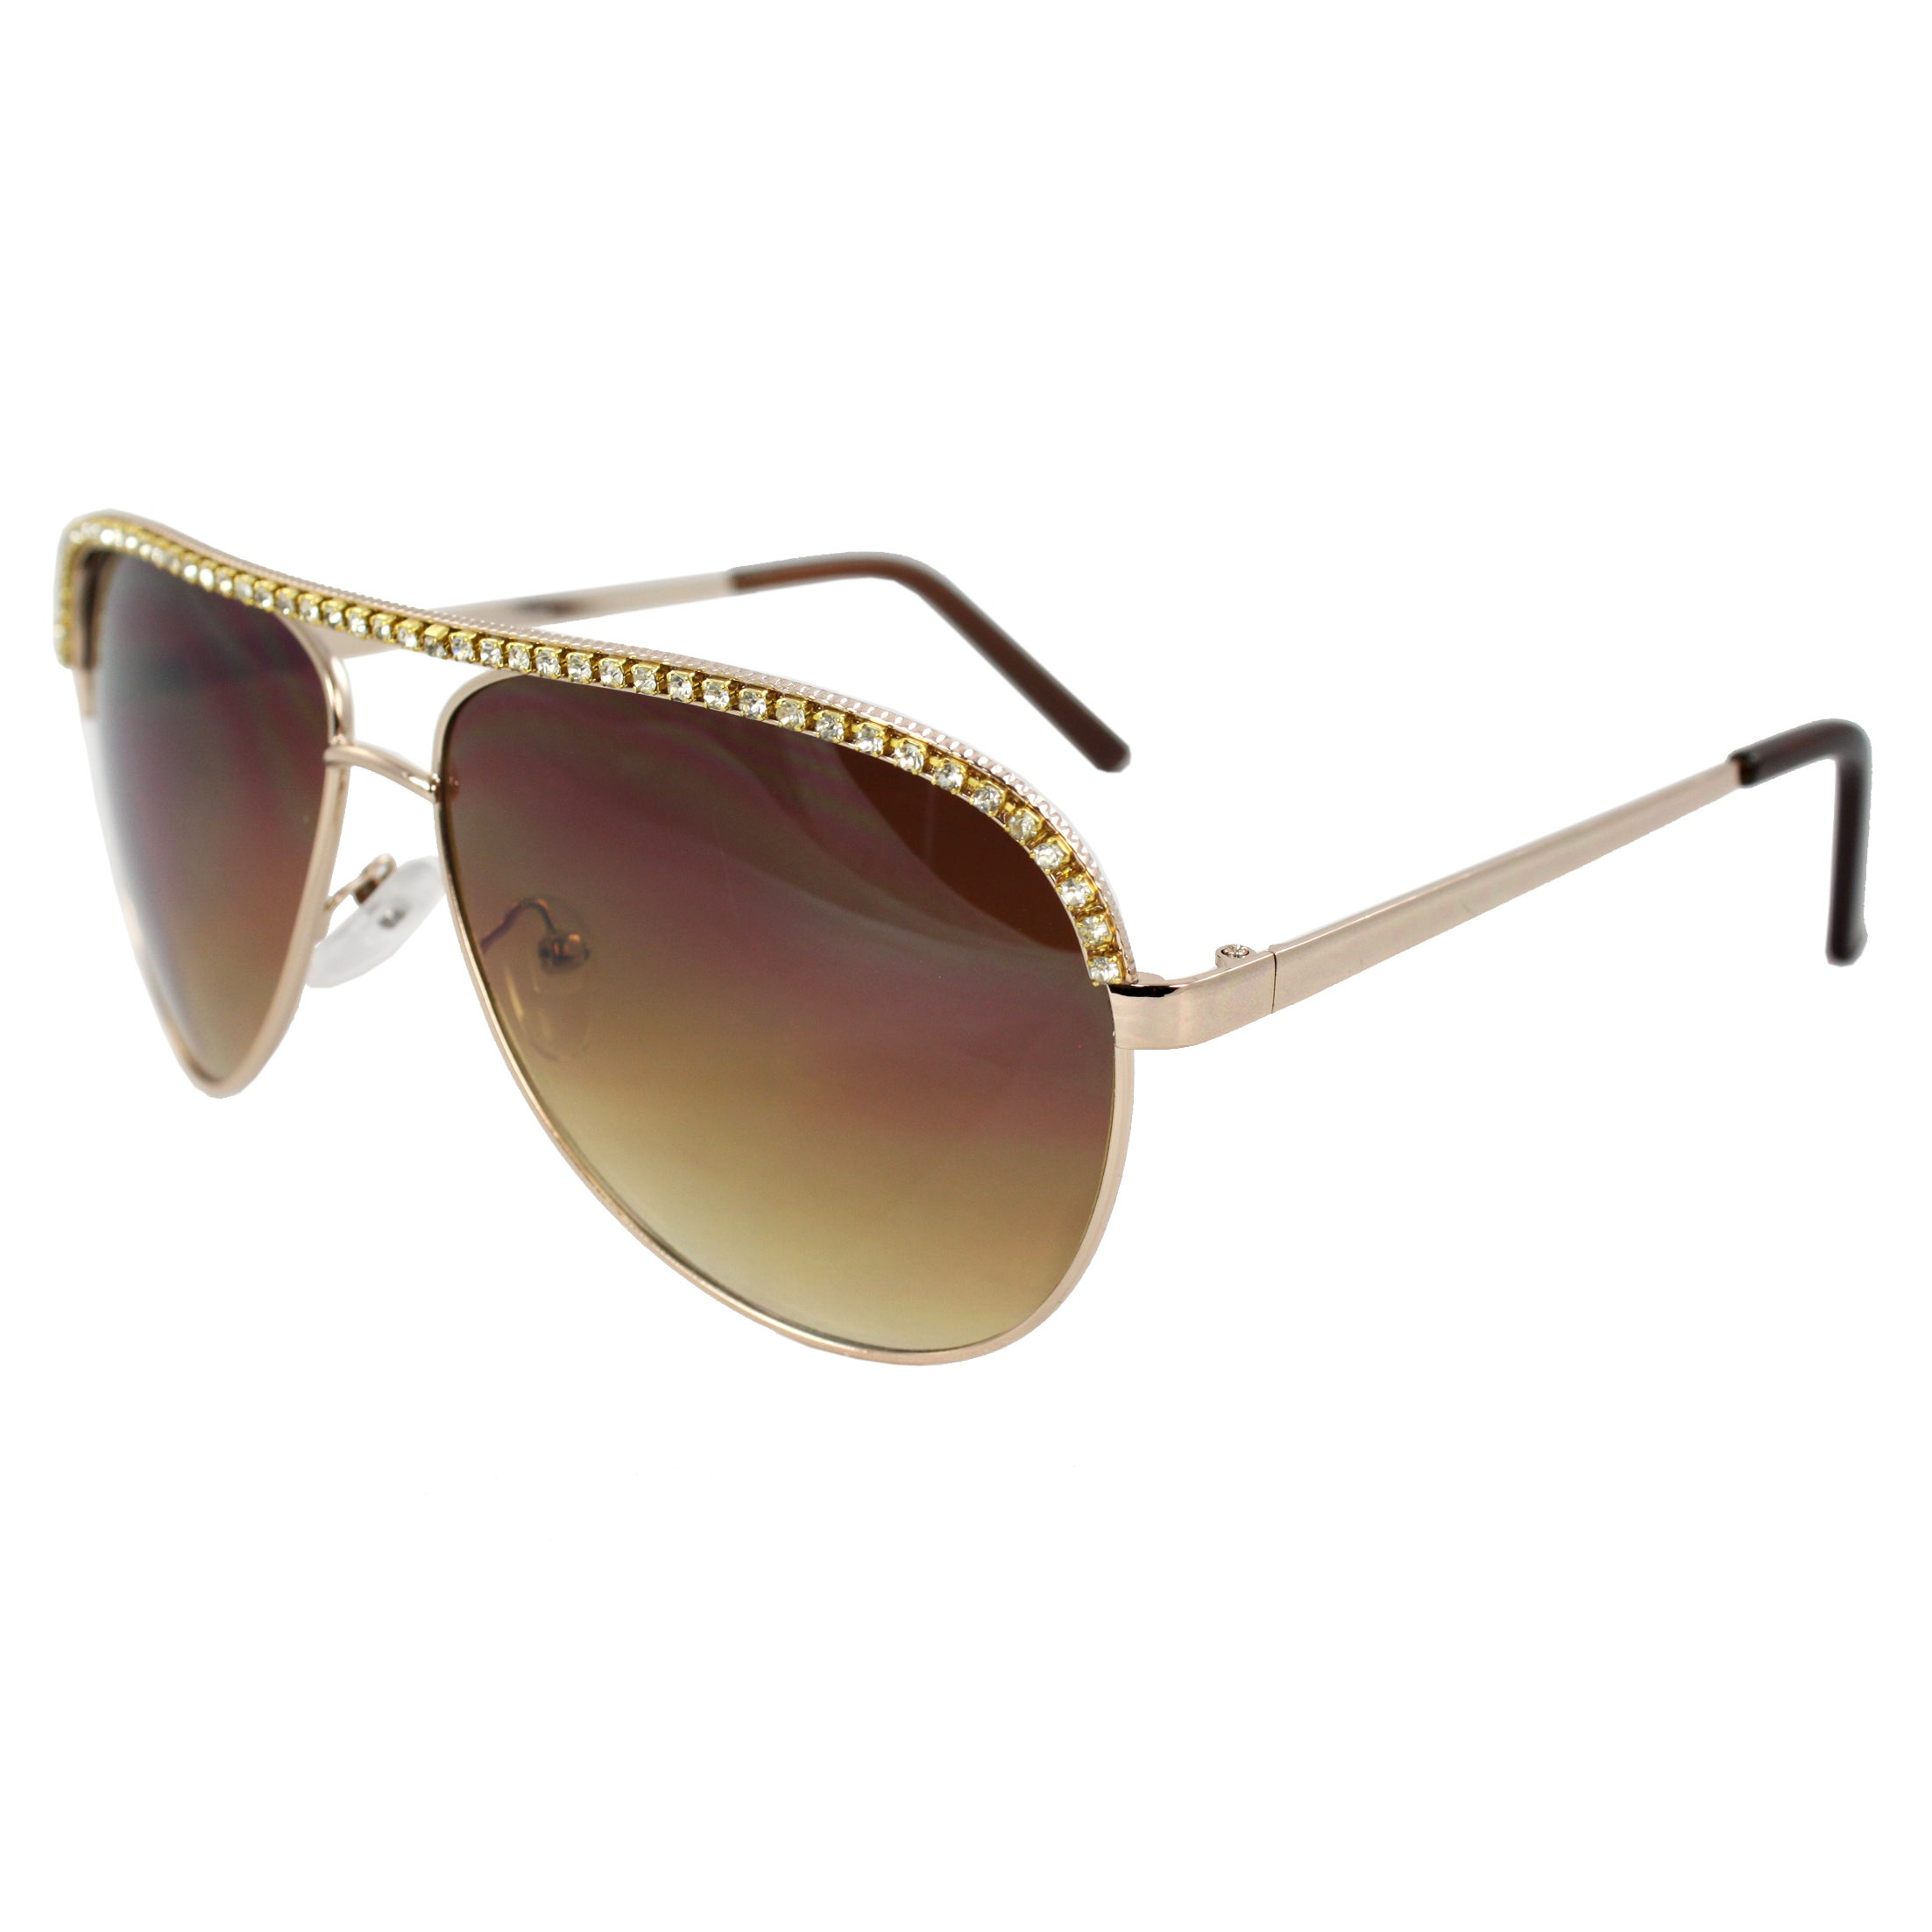 Women's Rhinestone Embellished Pilot Fashion Aviator Sunglasses